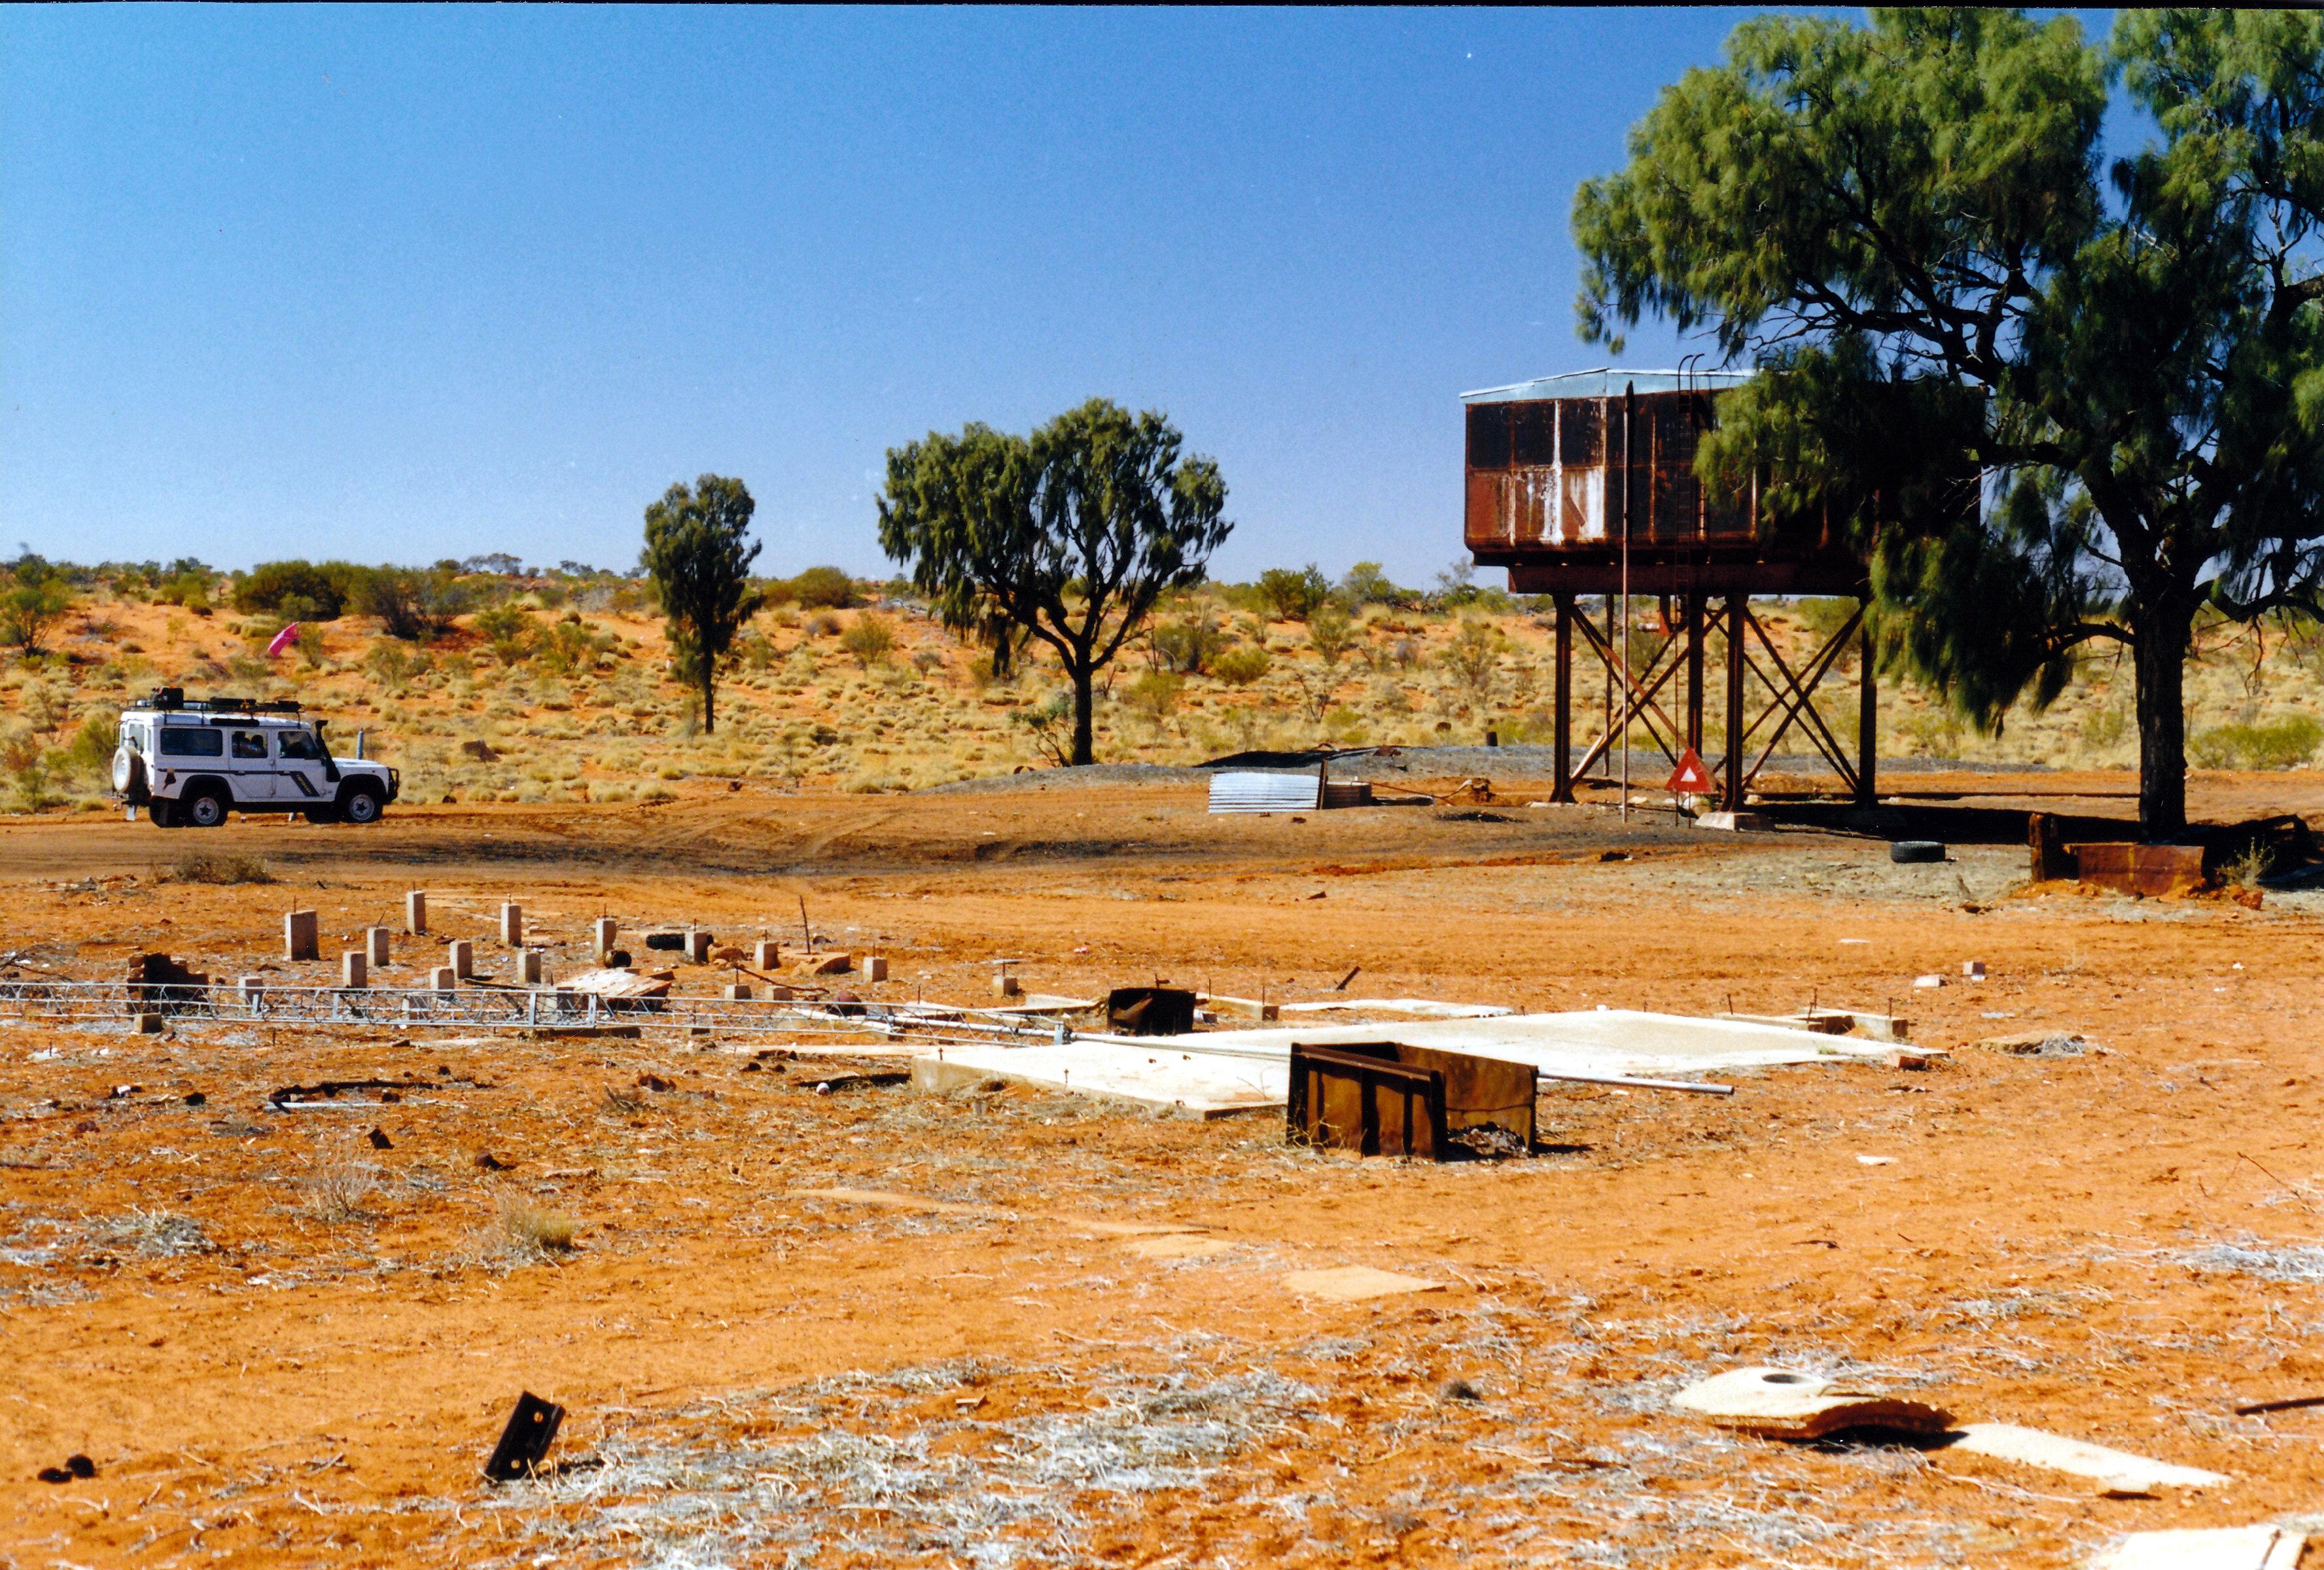 08-13-1999 05  Bundooma Siding ruins.jpg